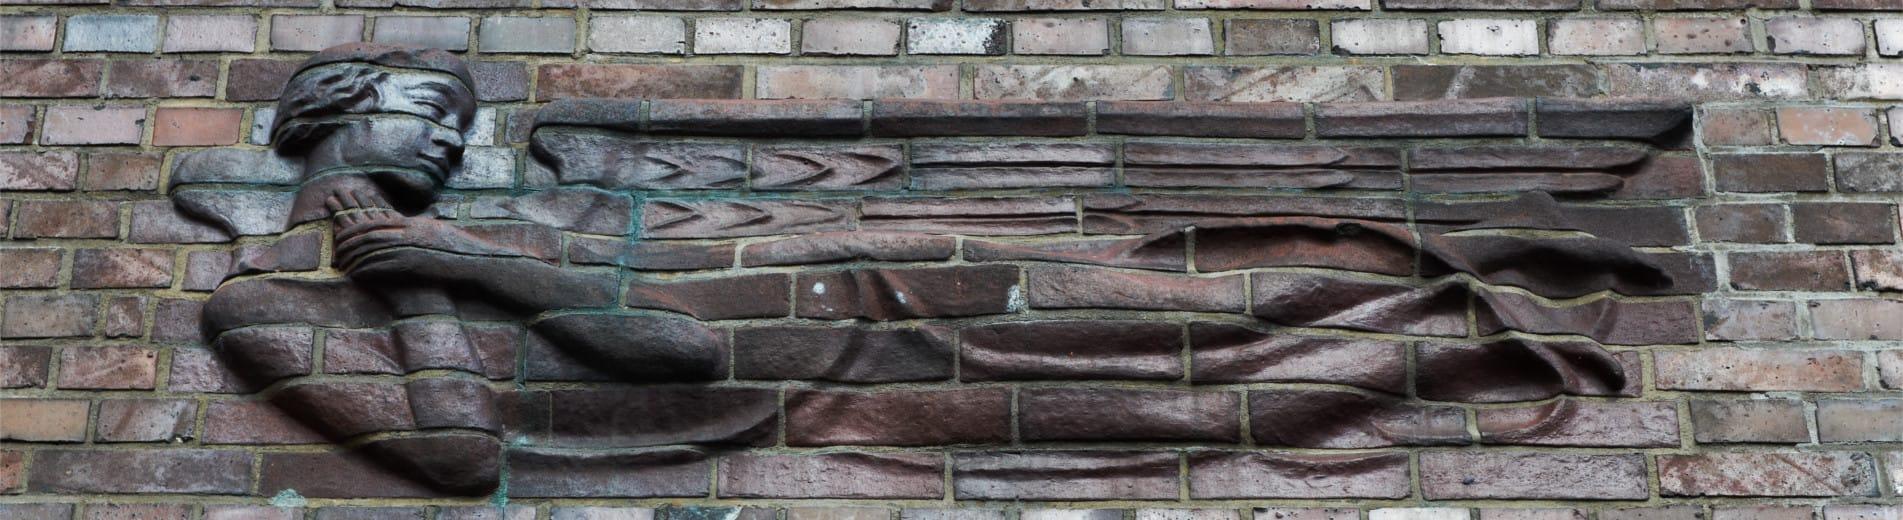 Krematorium Hamburg - Leitlinien